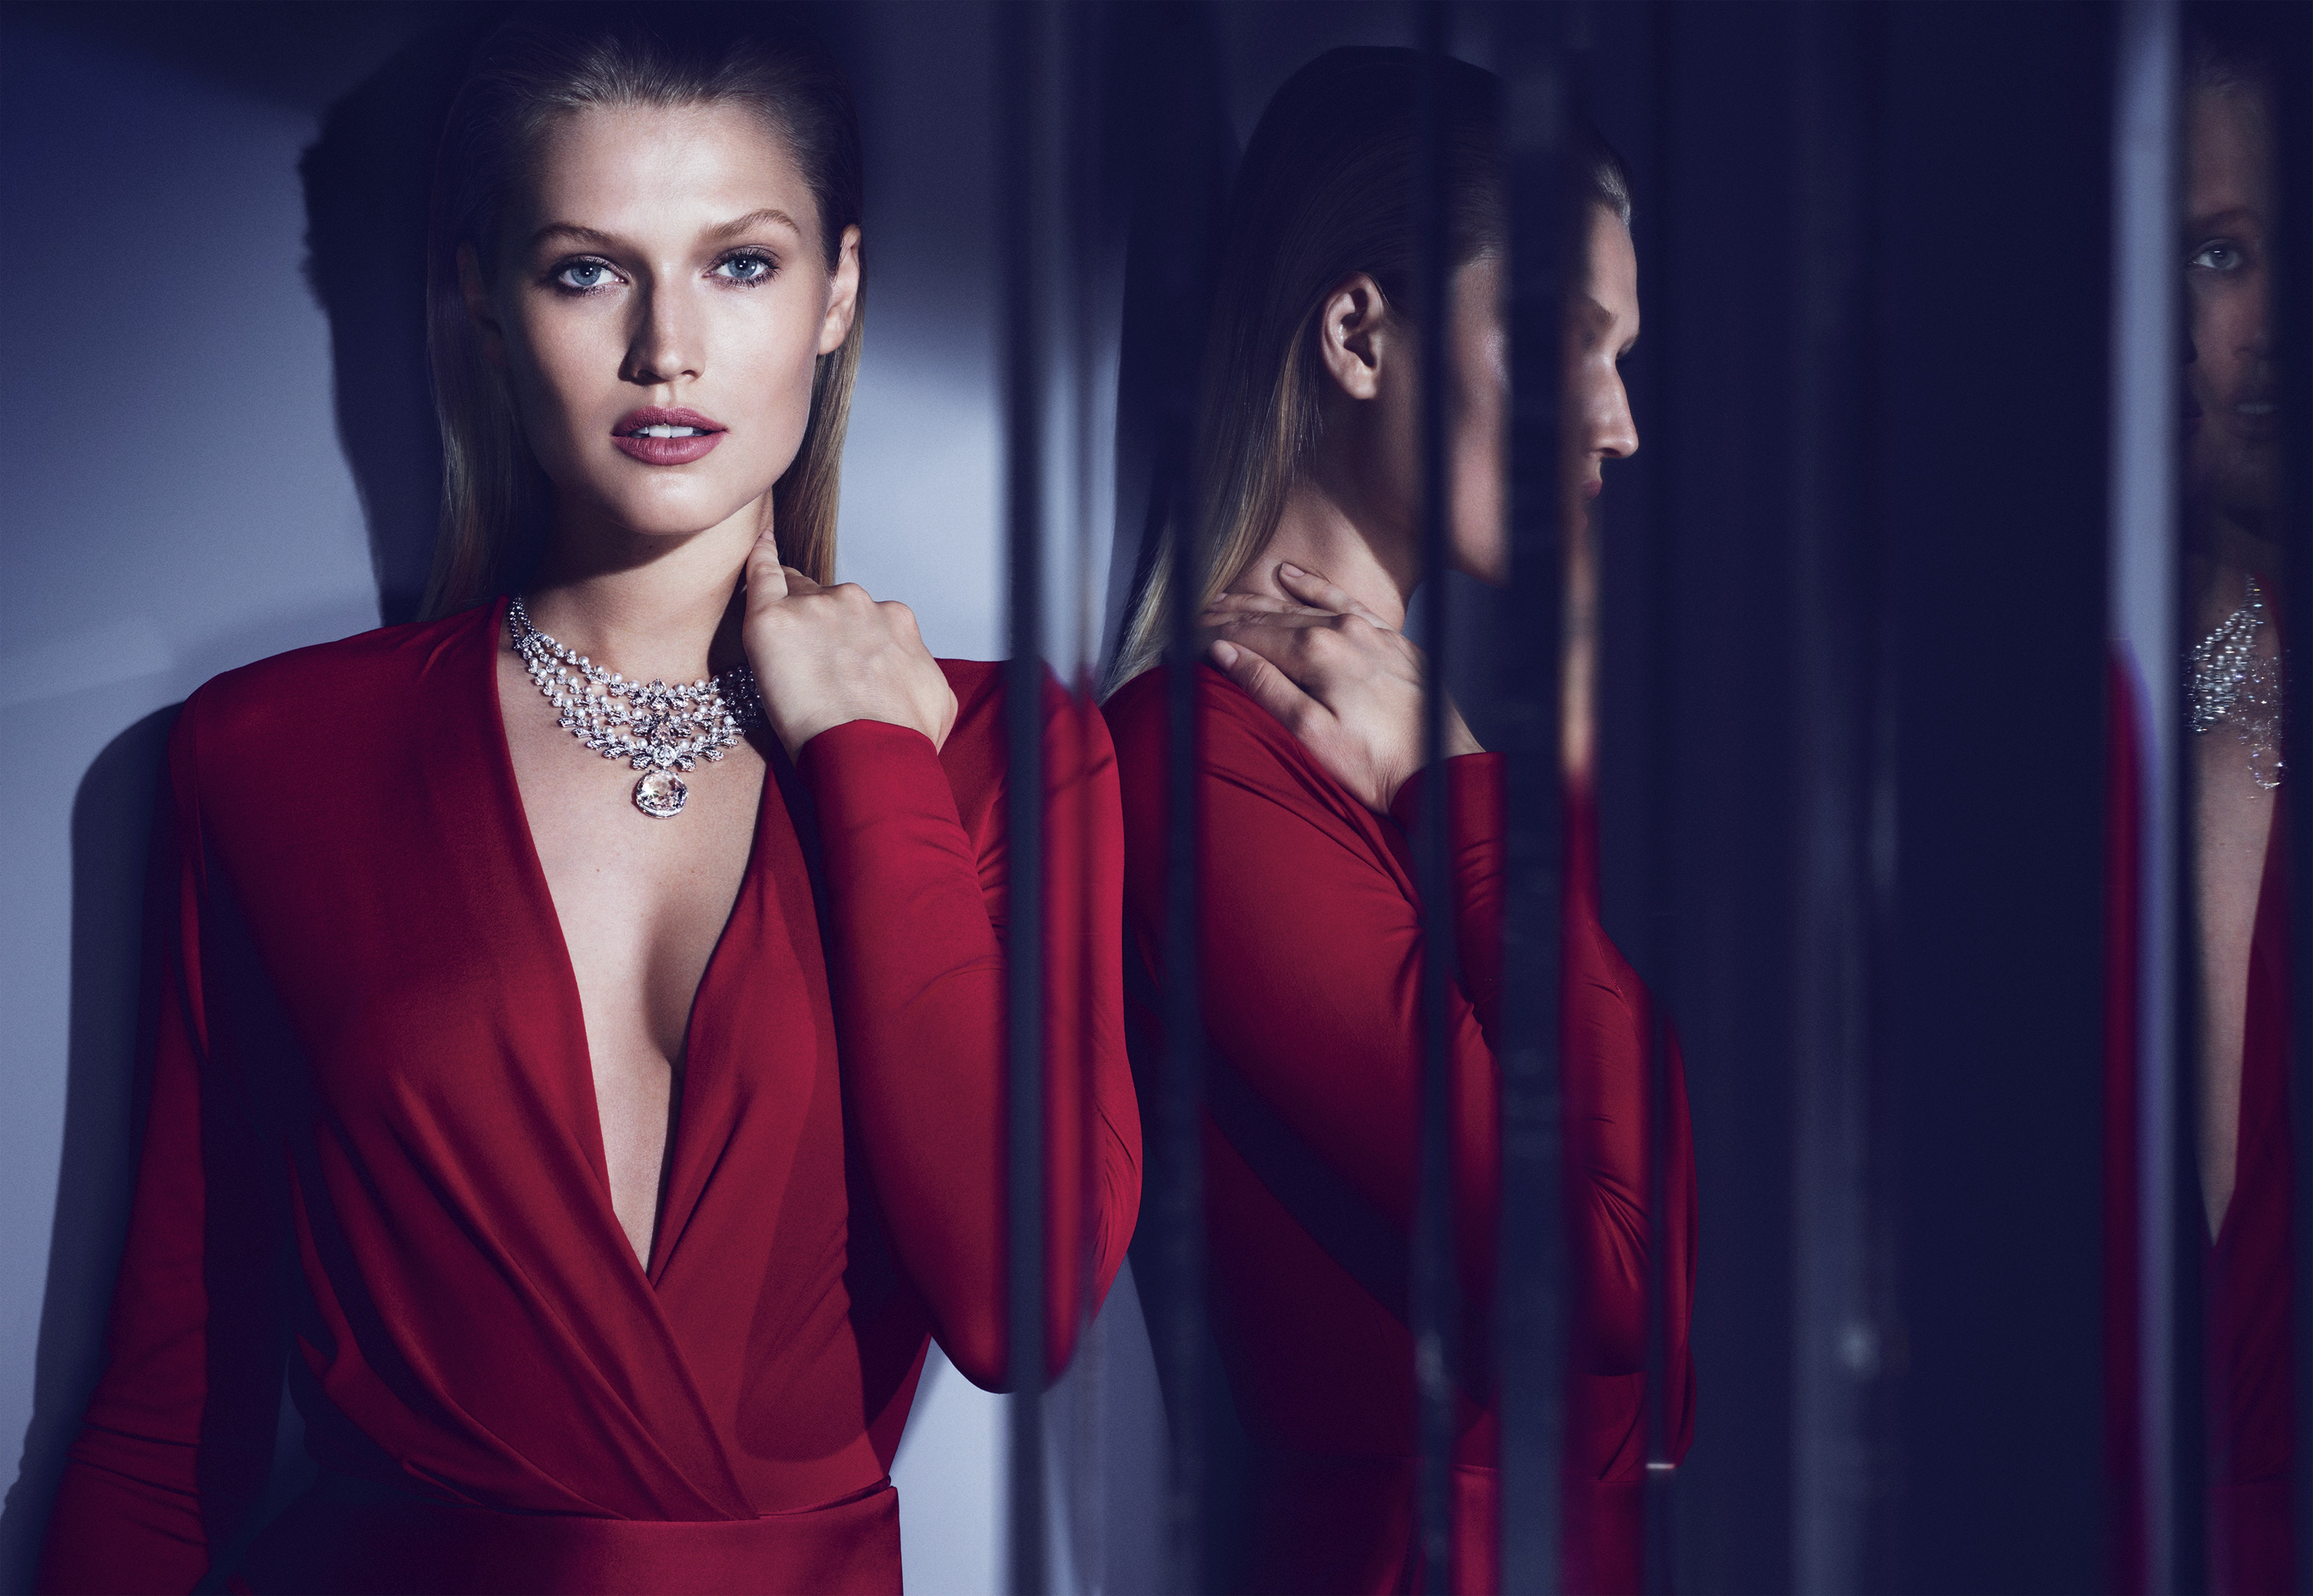 Magie Blanche necklace_Ben Hasset @Cartier 010716-300618